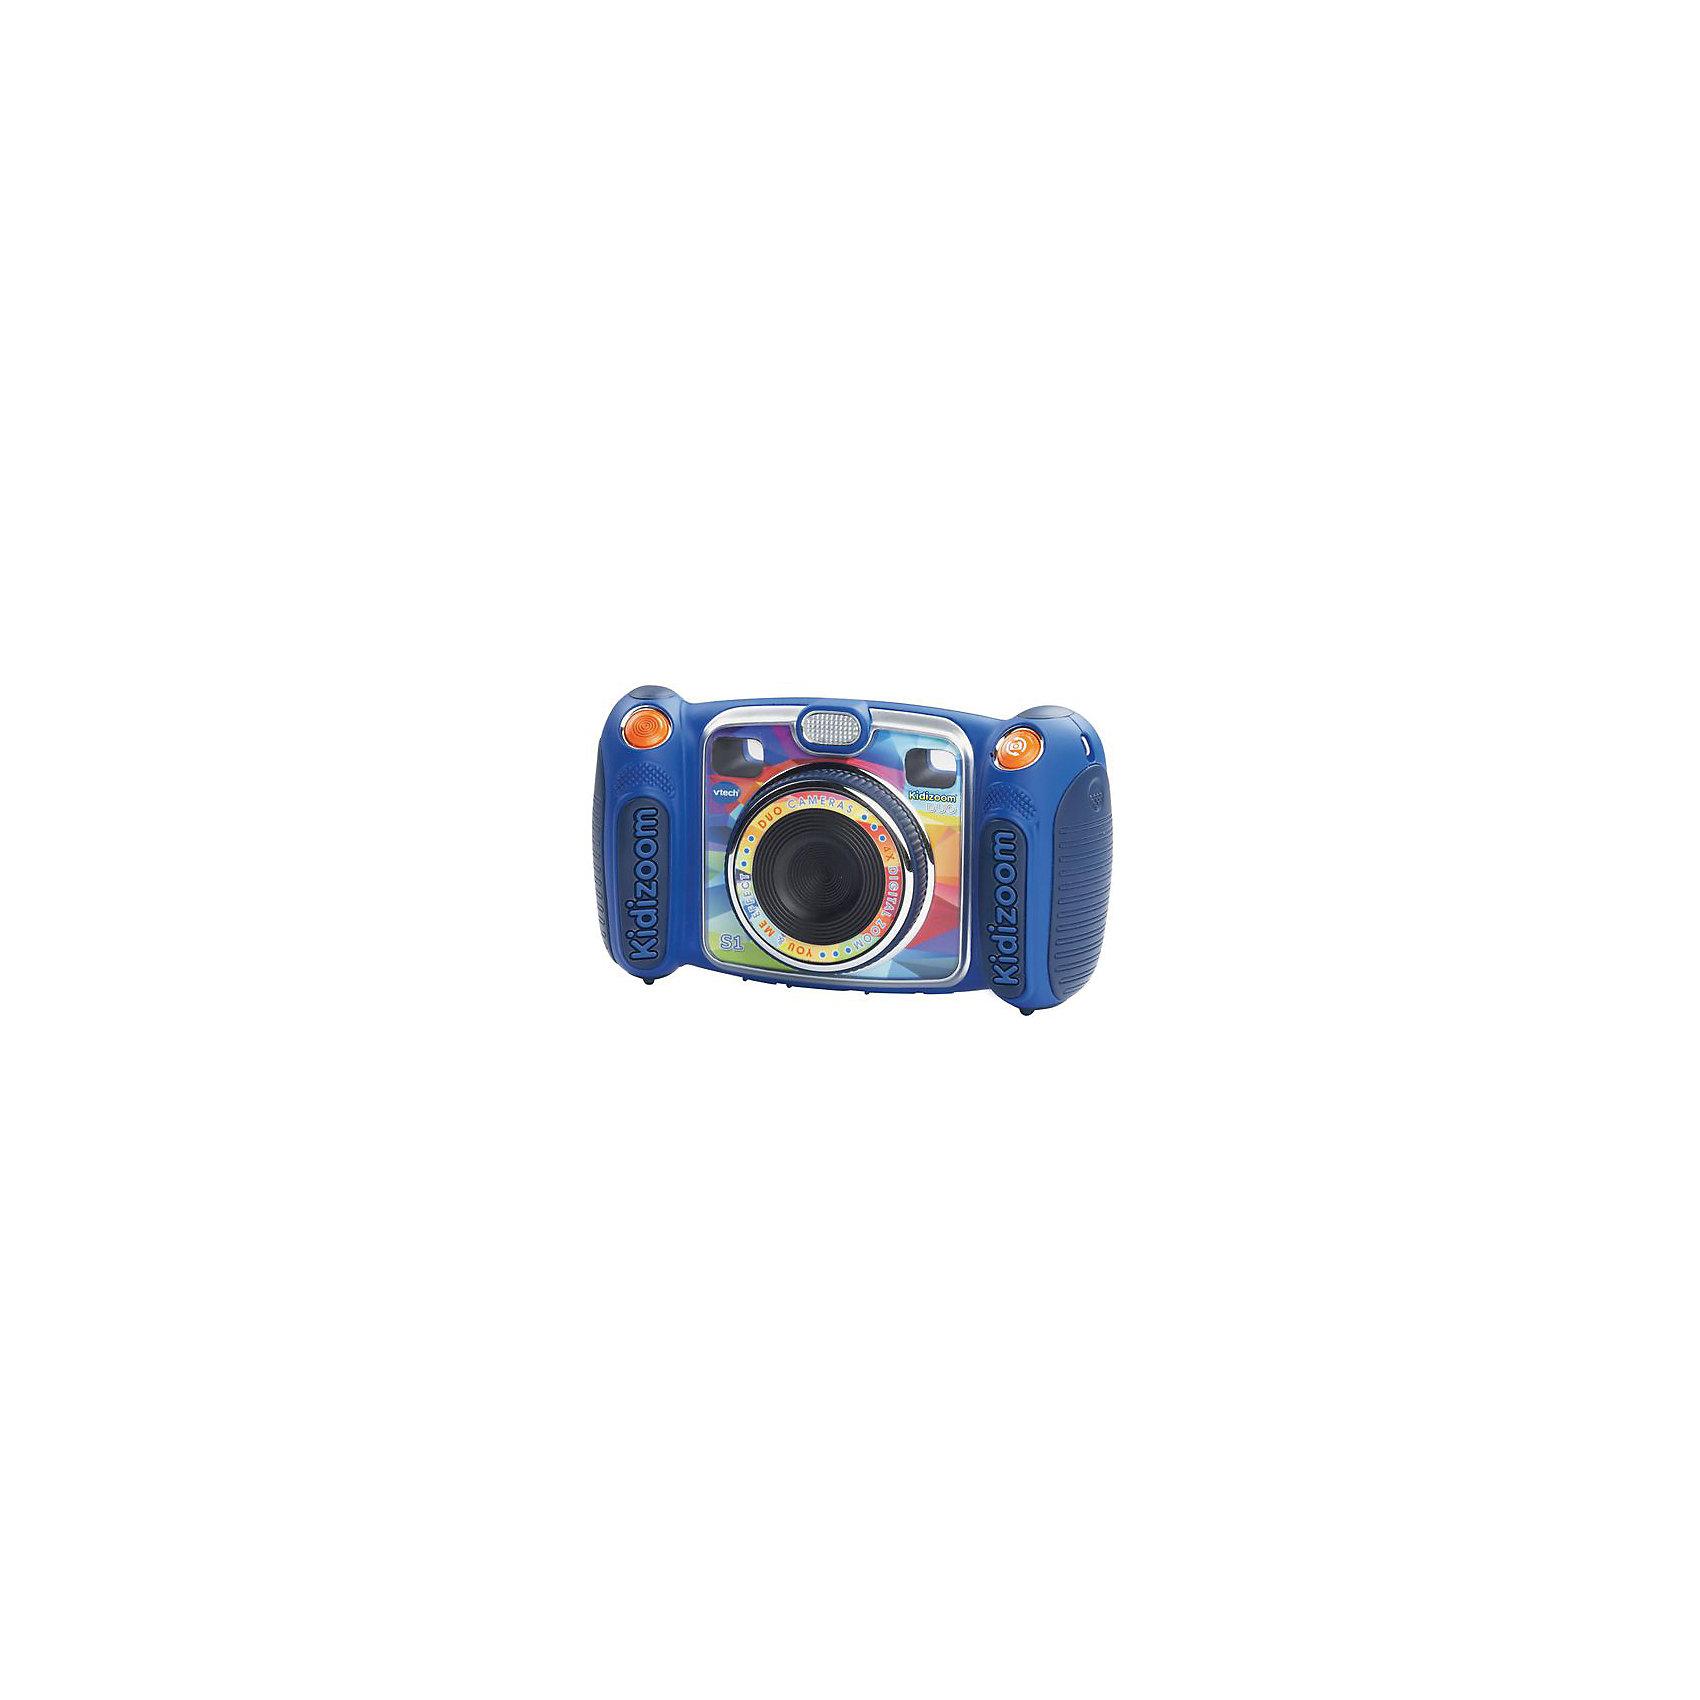 Цифровая камера Kidizoom duo, голубая, Vtech<br><br>Ширина мм: 203<br>Глубина мм: 279<br>Высота мм: 71<br>Вес г: 1550<br>Возраст от месяцев: 72<br>Возраст до месяцев: 108<br>Пол: Унисекс<br>Возраст: Детский<br>SKU: 5471079